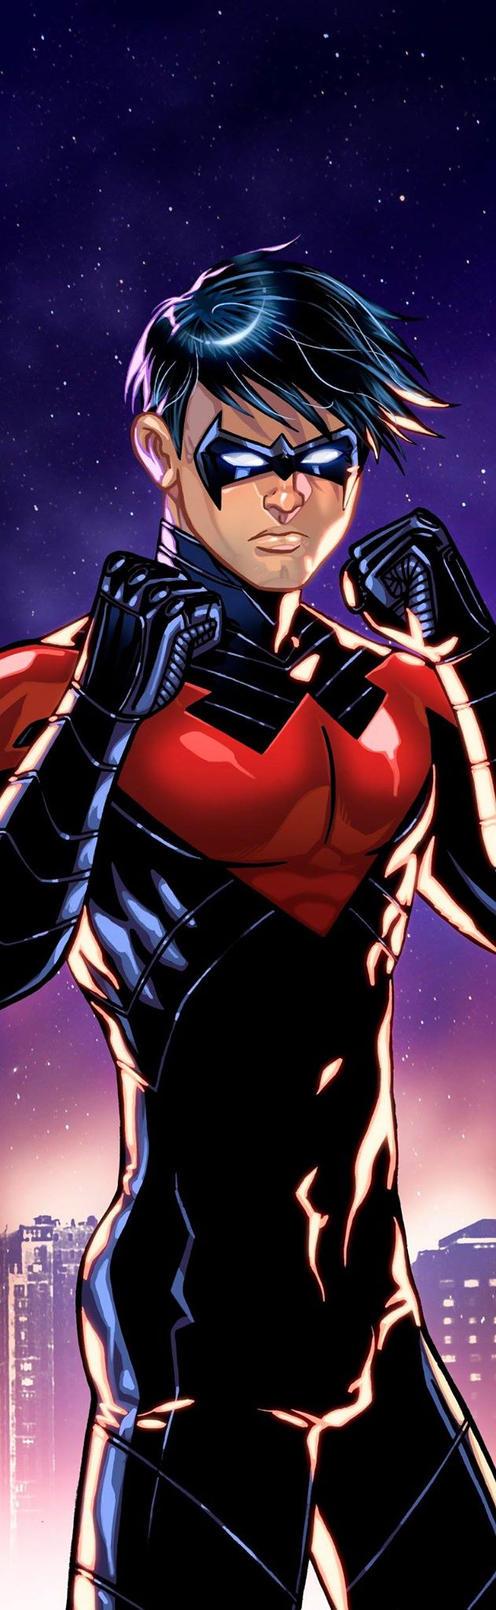 Nightwing Panel Art 2 by RichBernatovech